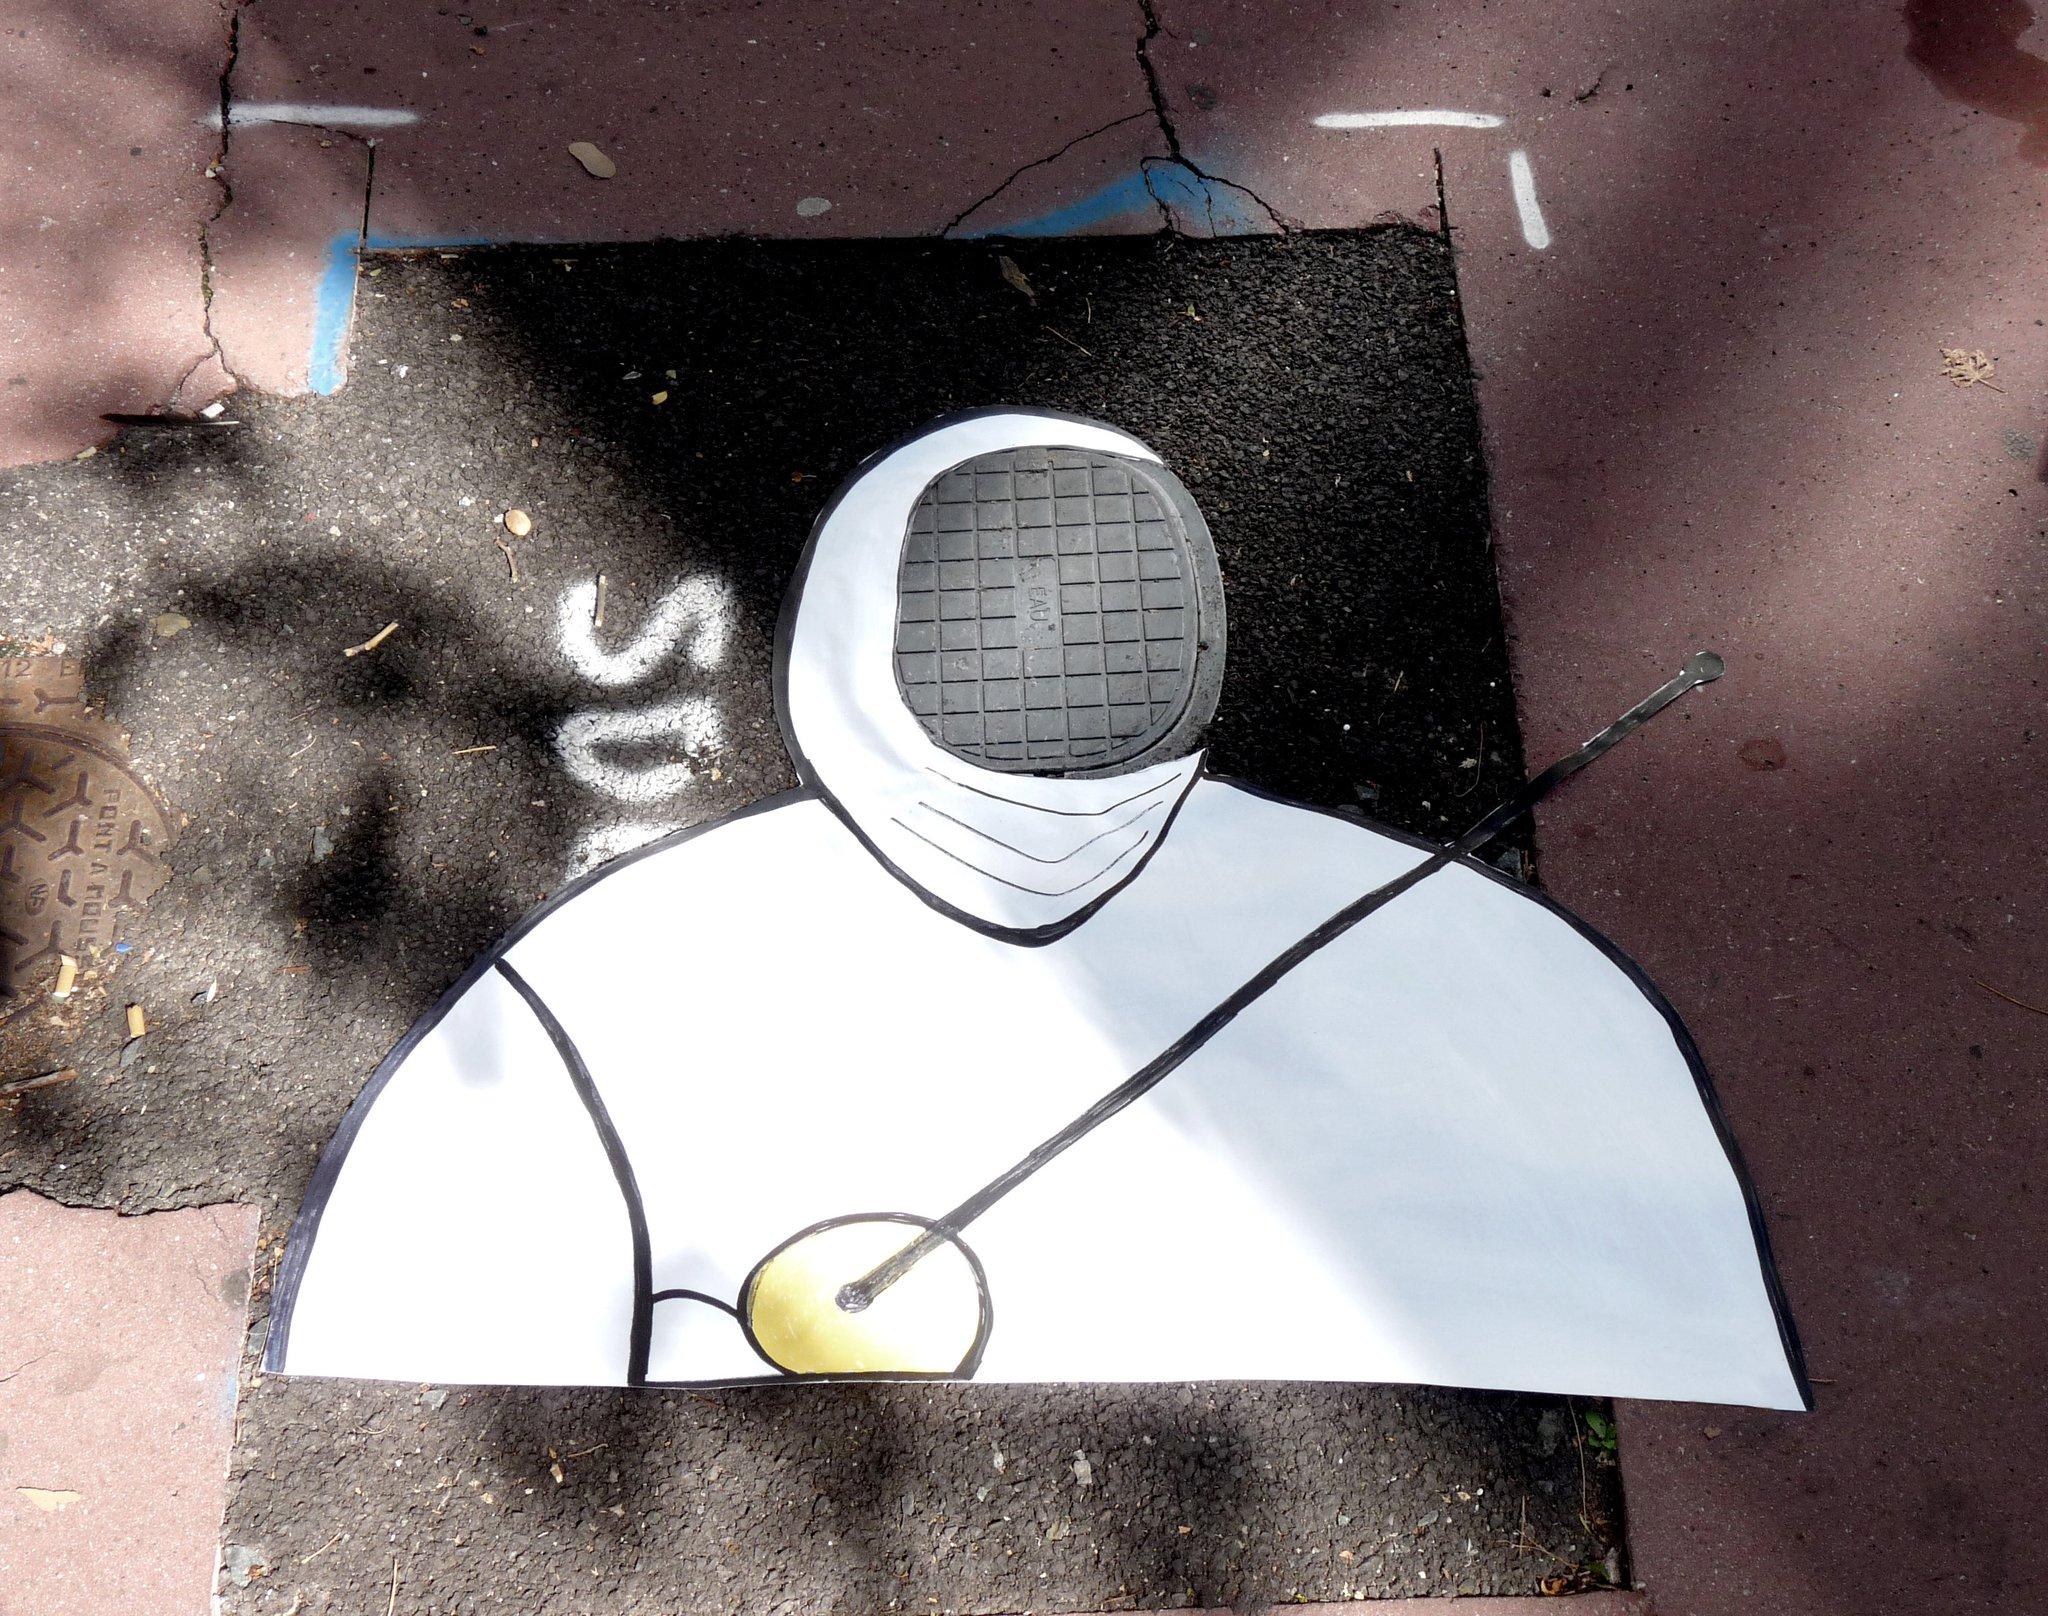 cool-street-art-from-paris-oak-oak-part2-11